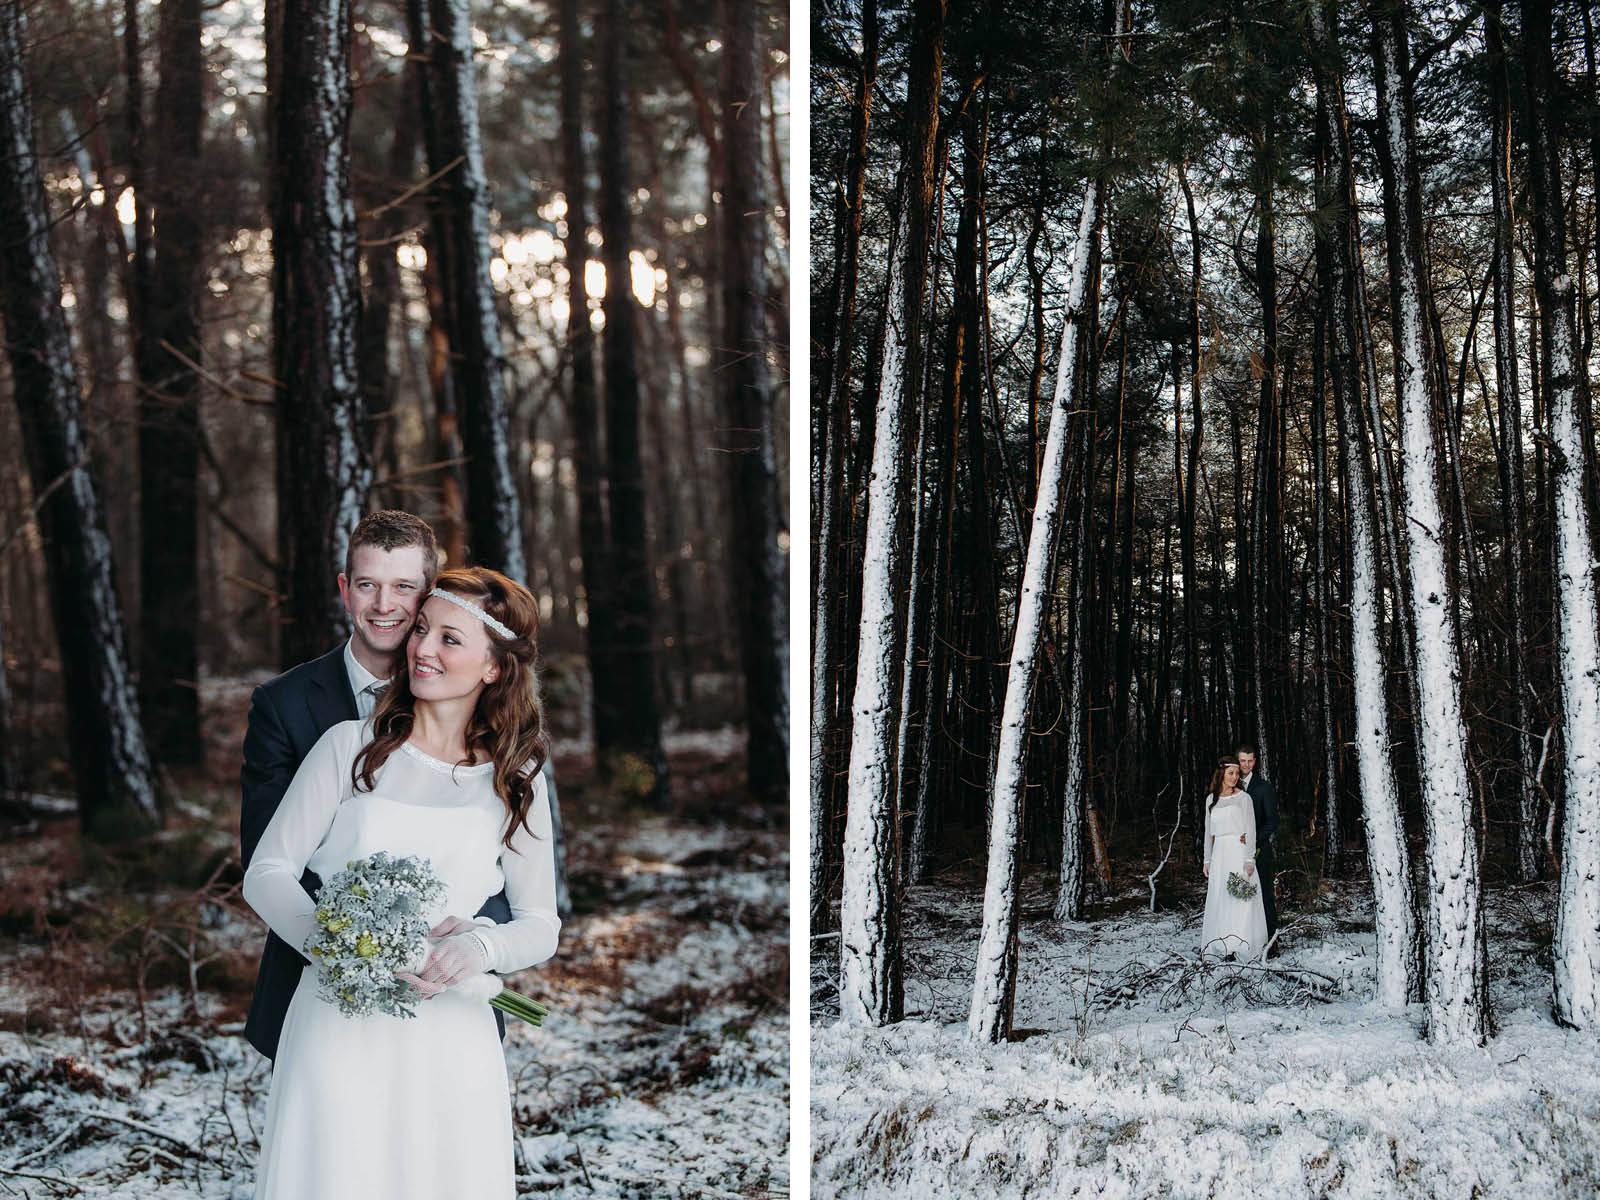 Evabloemweddings_bruidsfotografie_winterbruiloft_050.jpg